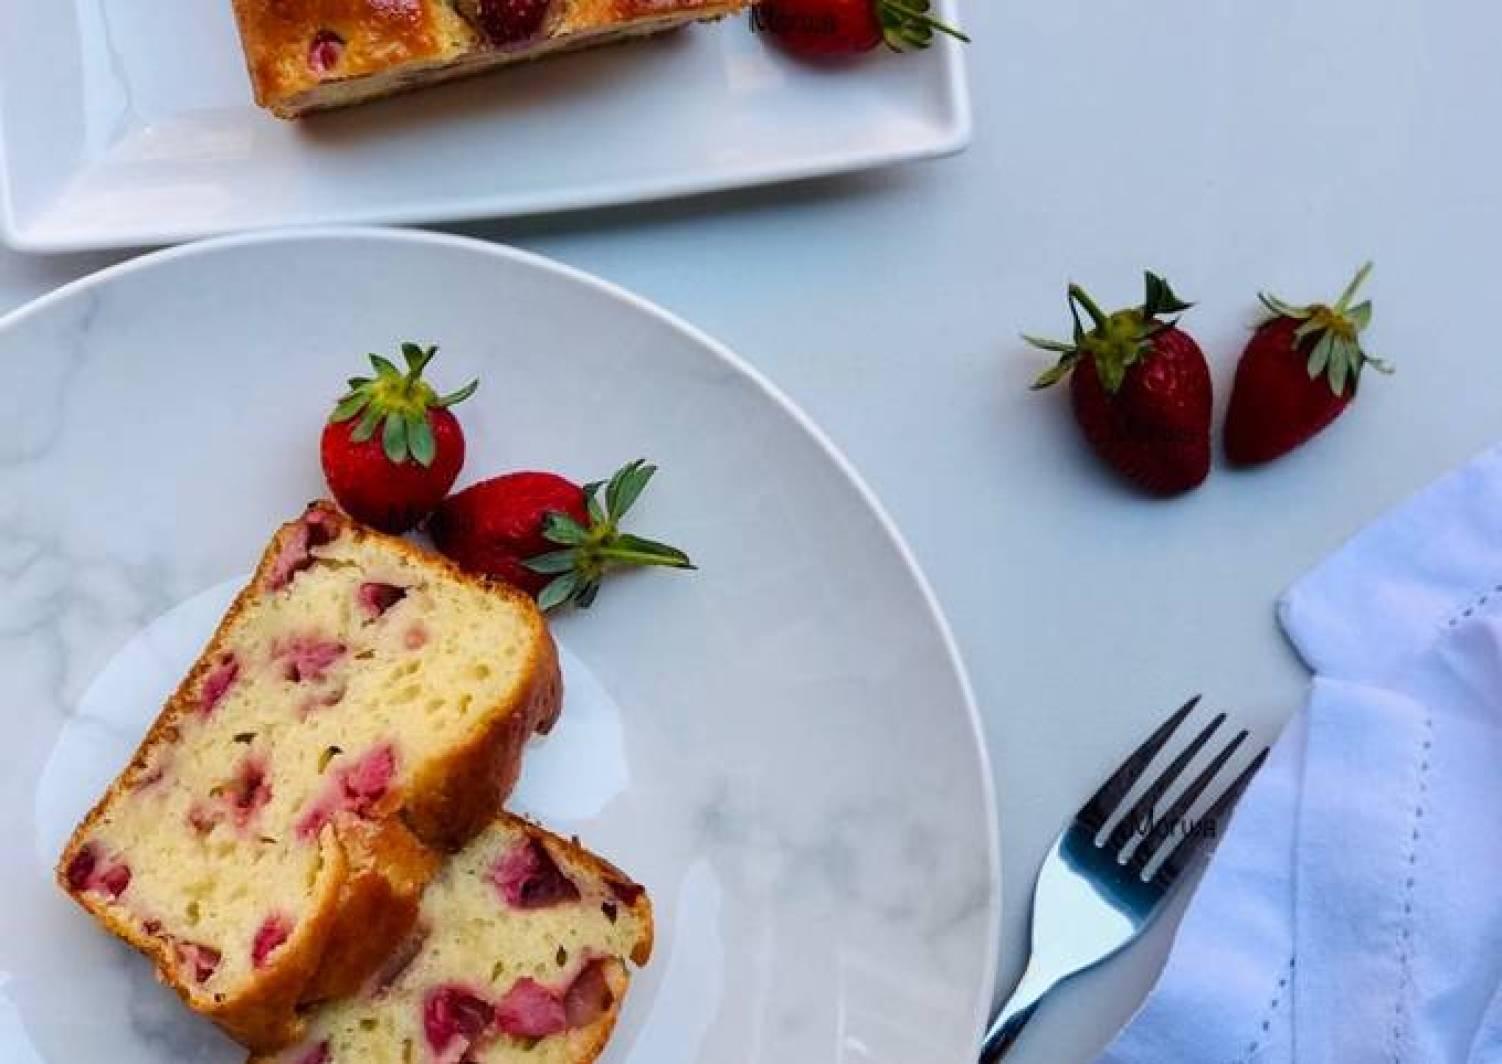 Strawberry loaf cake